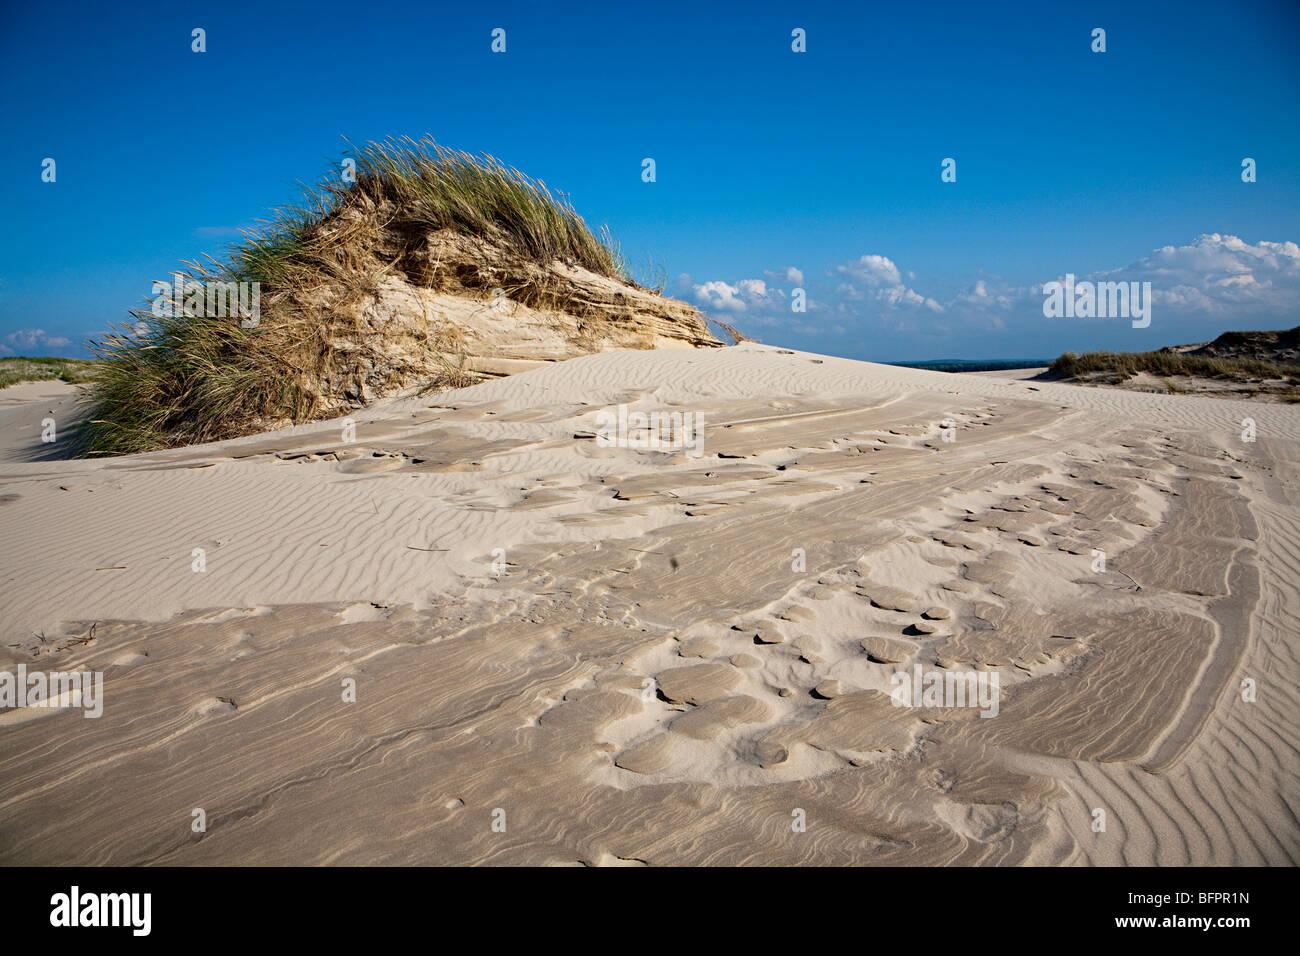 Marram grass Ammophilia arenaria consolidating Wydma Czolpinska dune Slowinski national park Poland - Stock Image